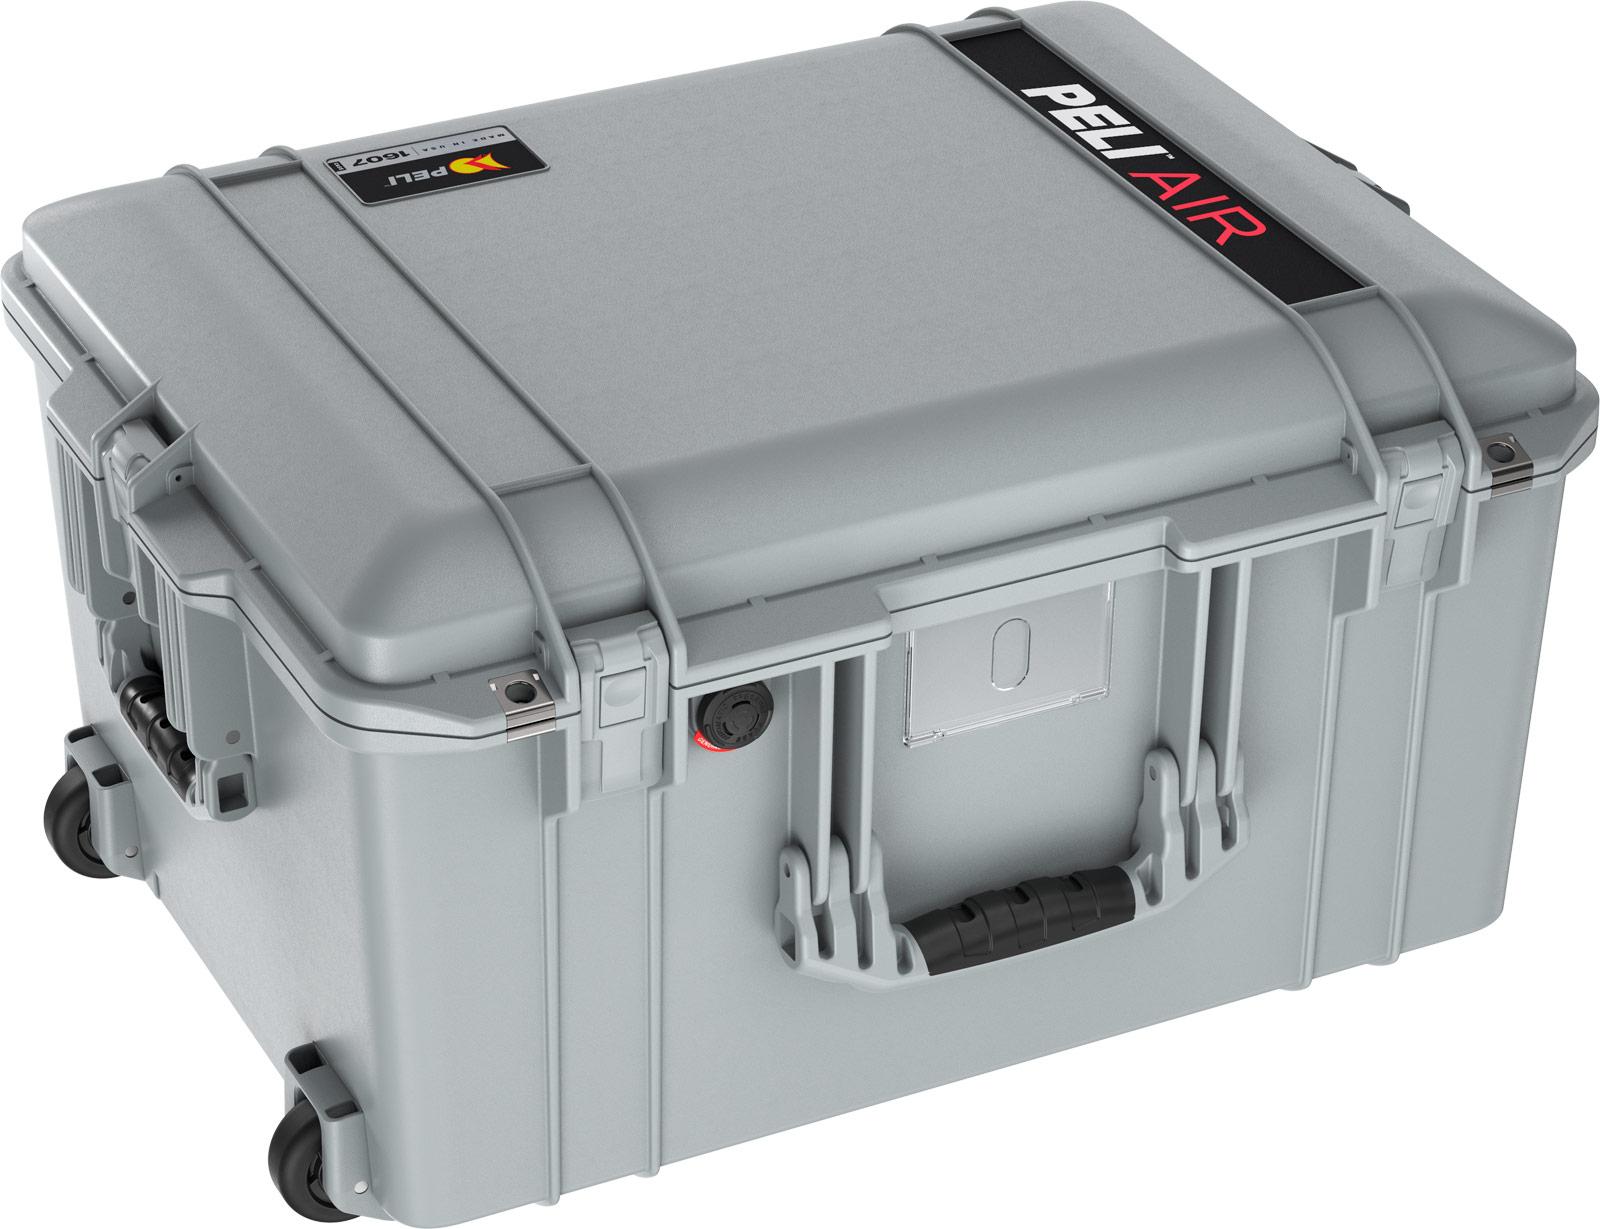 peli air deep rolling case protection grey